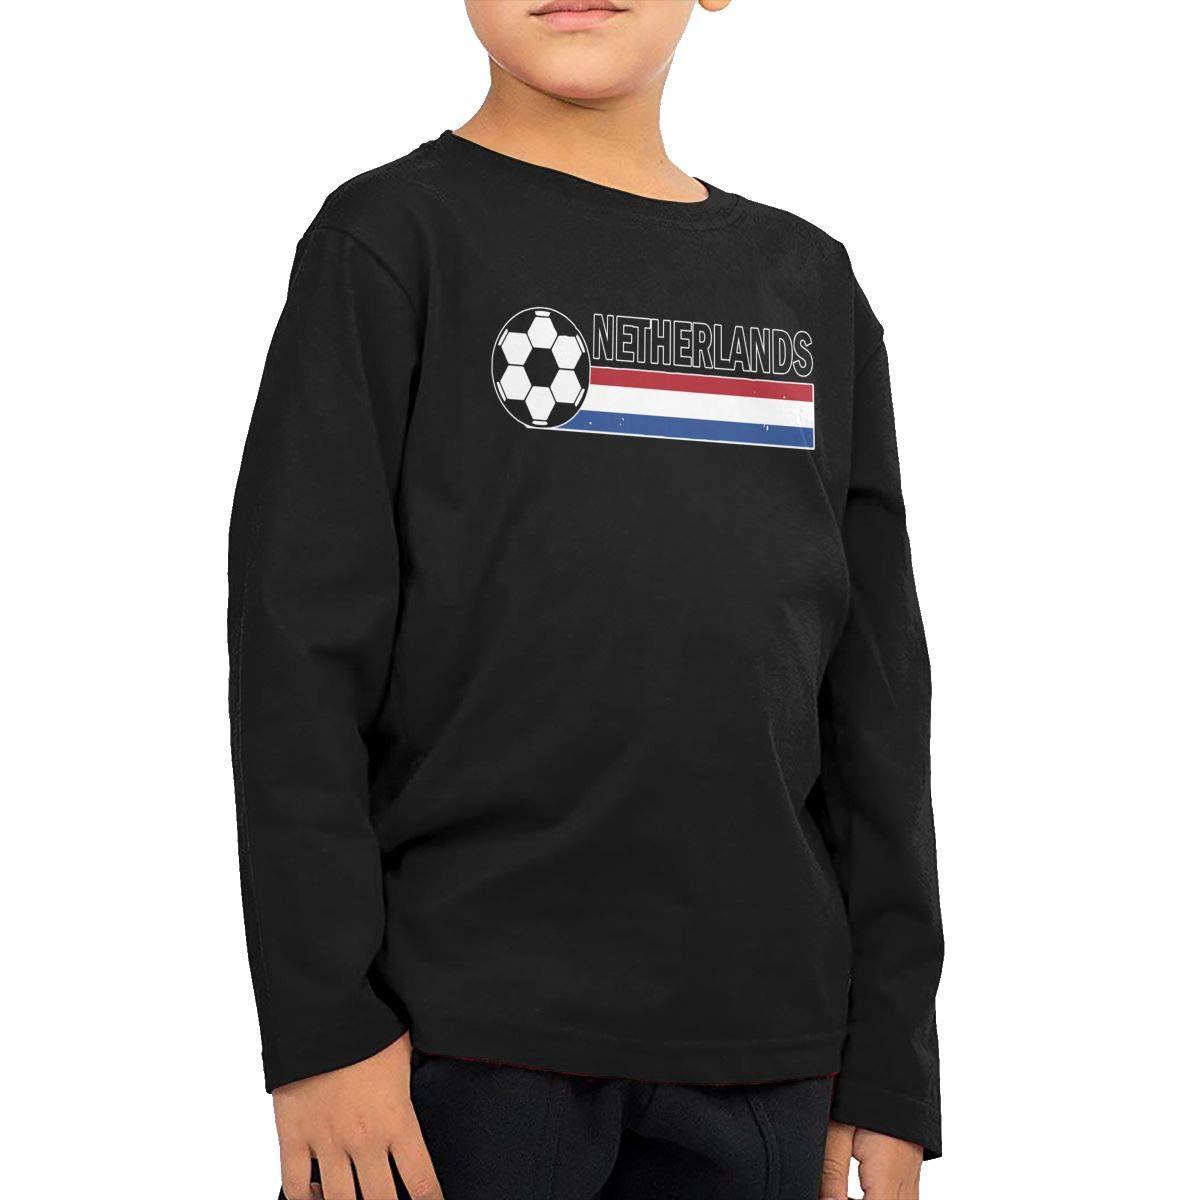 Netherlands Flag Soccer Football Kids Boys Girls Crewneck Long Sleeve Shirt T-Shirt for Toddlers